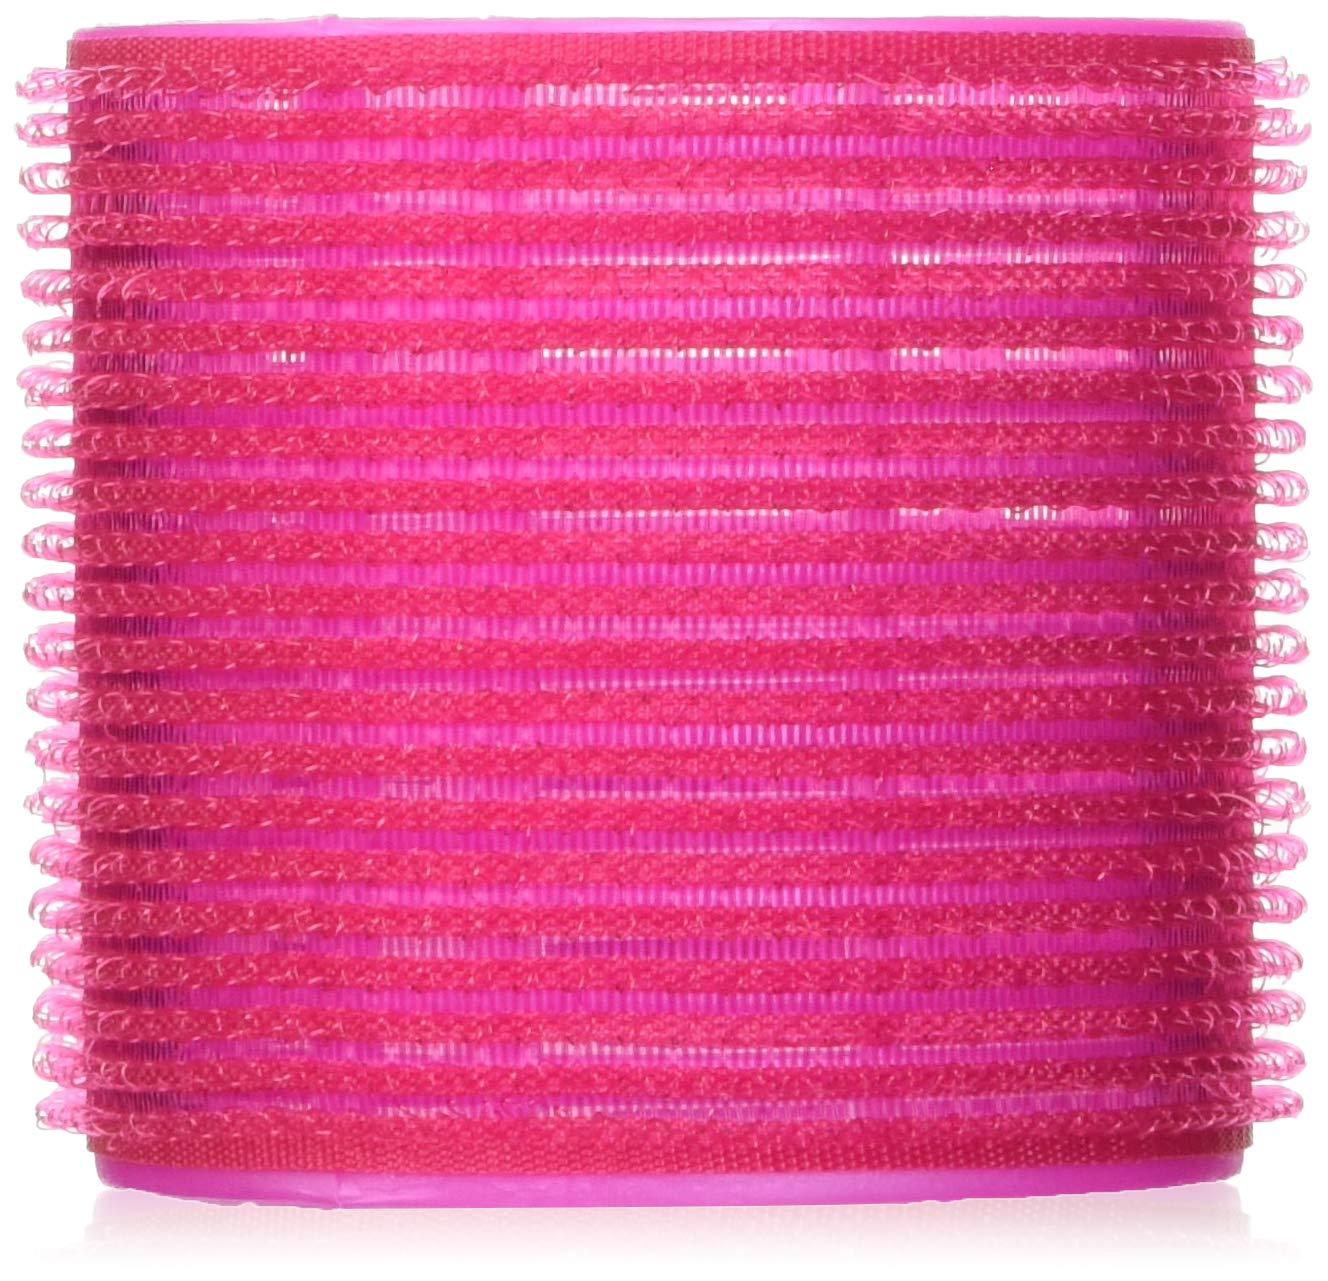 Conair Mega Self Holding Rollers discount Count Nippon regular agency 9 Pink